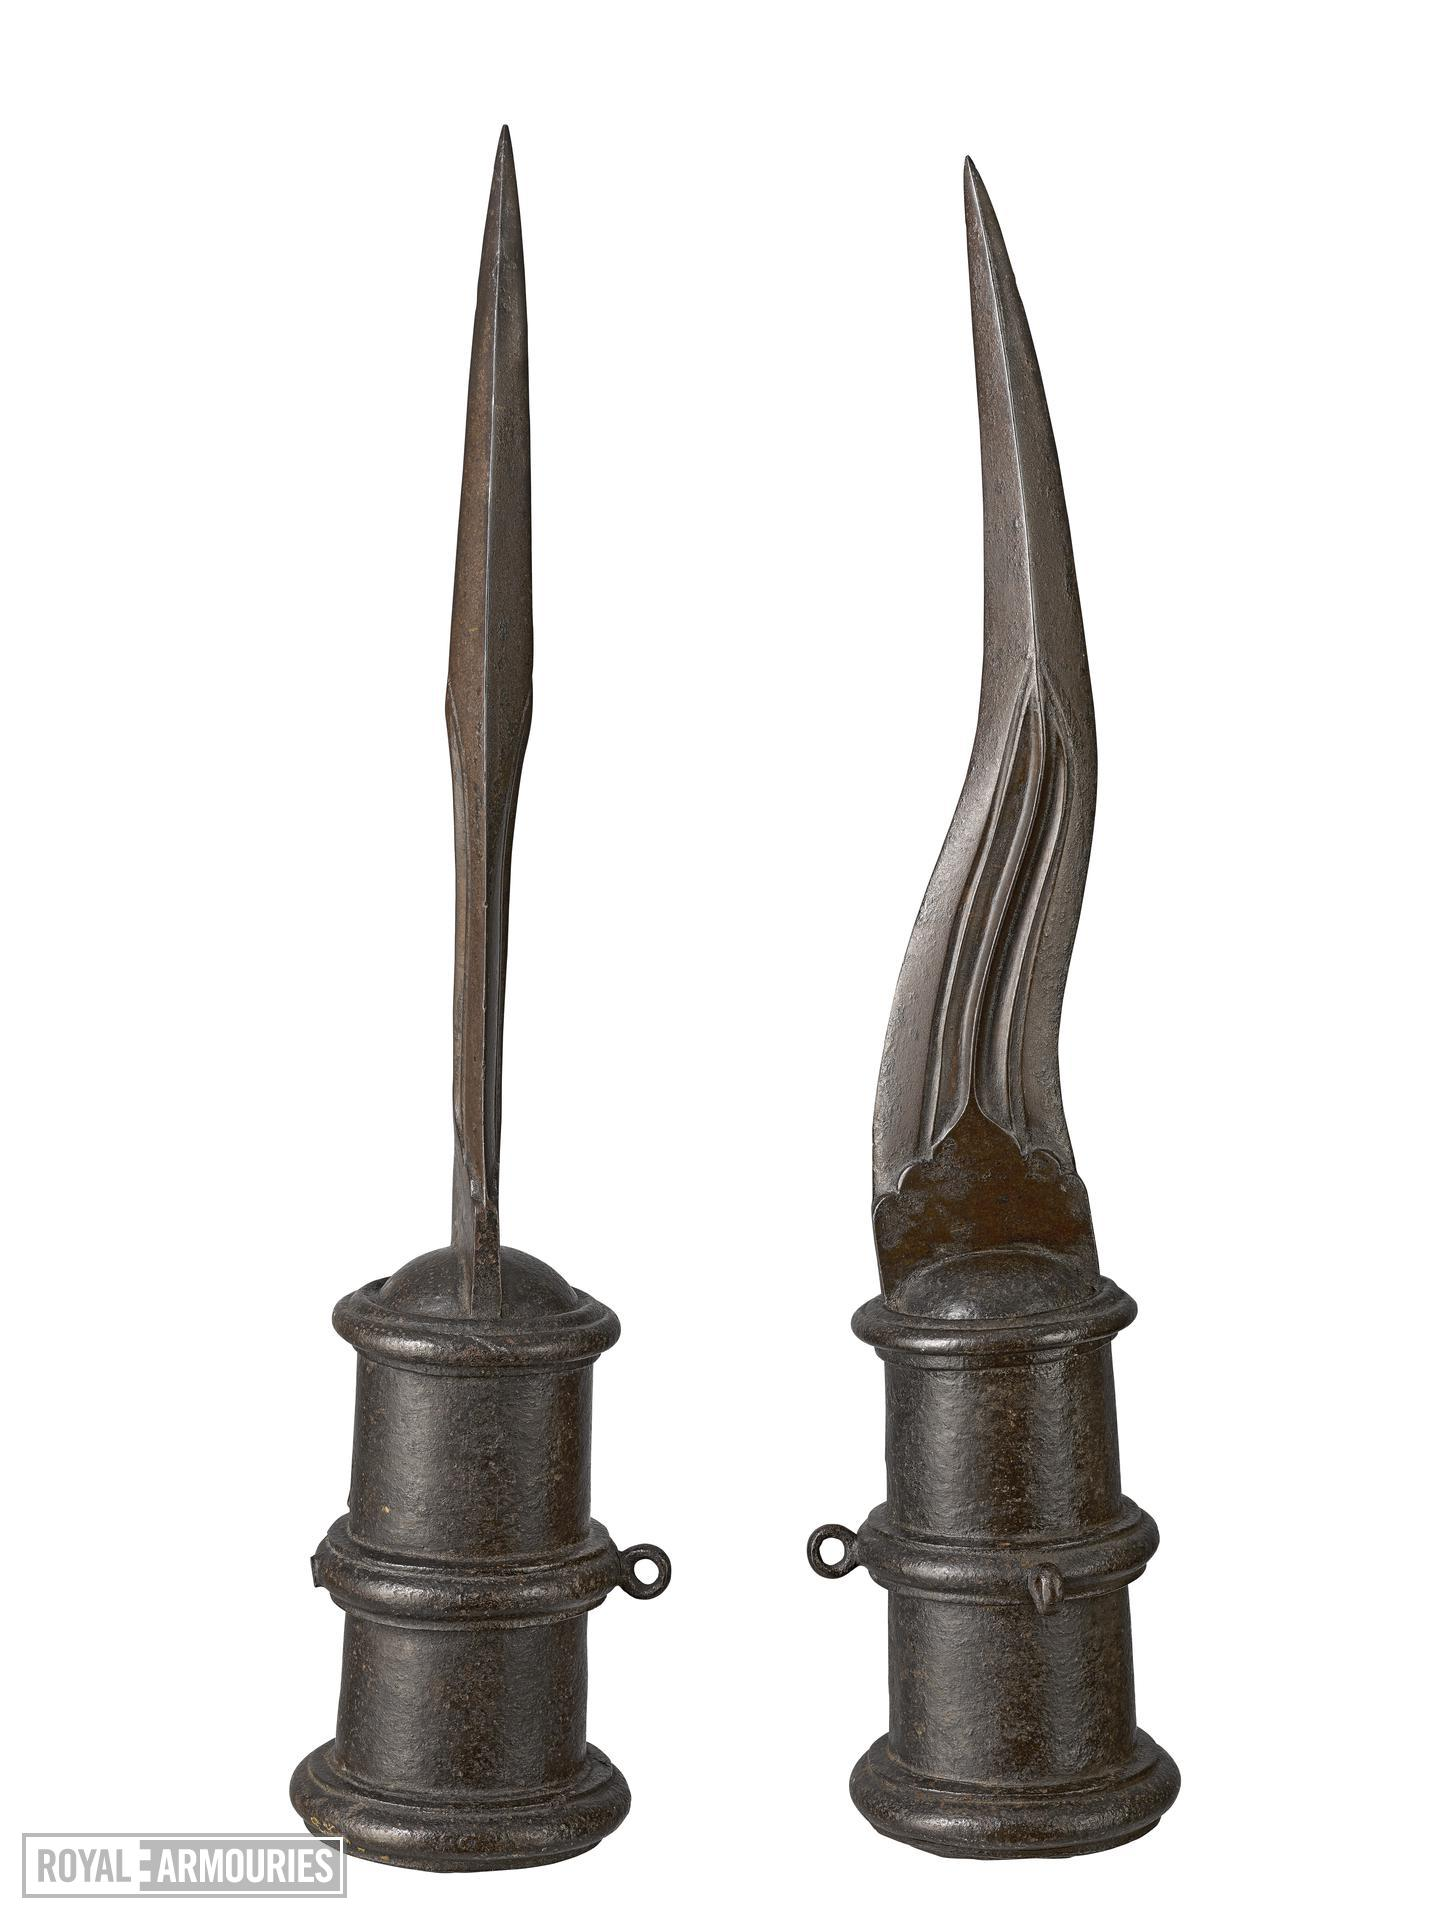 Pair of elephant tusk swords, India, about 1600 XXVIM.40